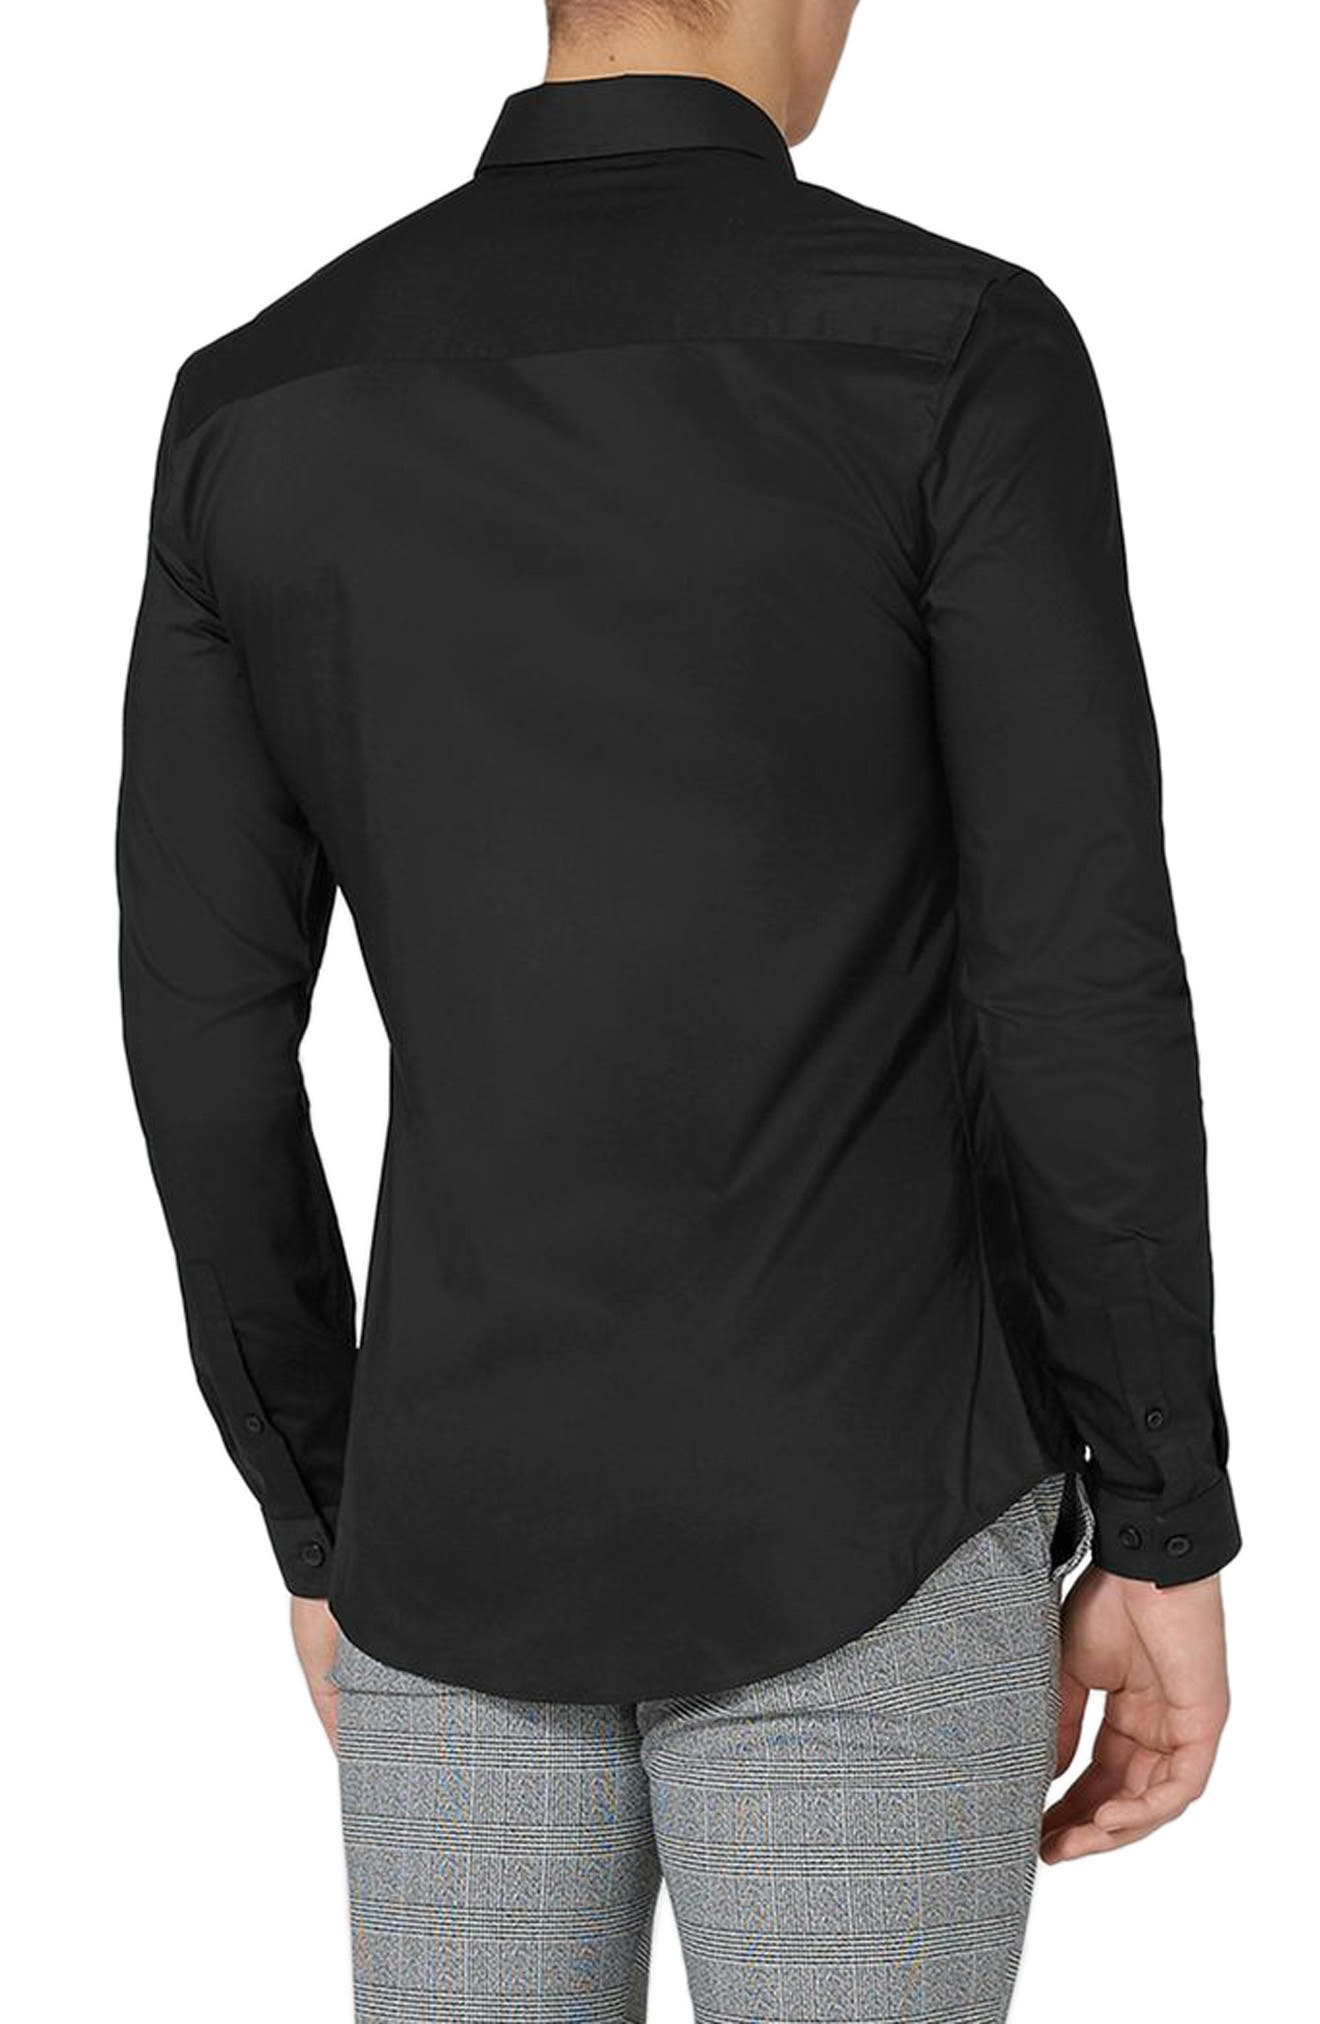 TOPMAN, Muscle Fit Stretch Poplin Shirt, Alternate thumbnail 2, color, BLACK